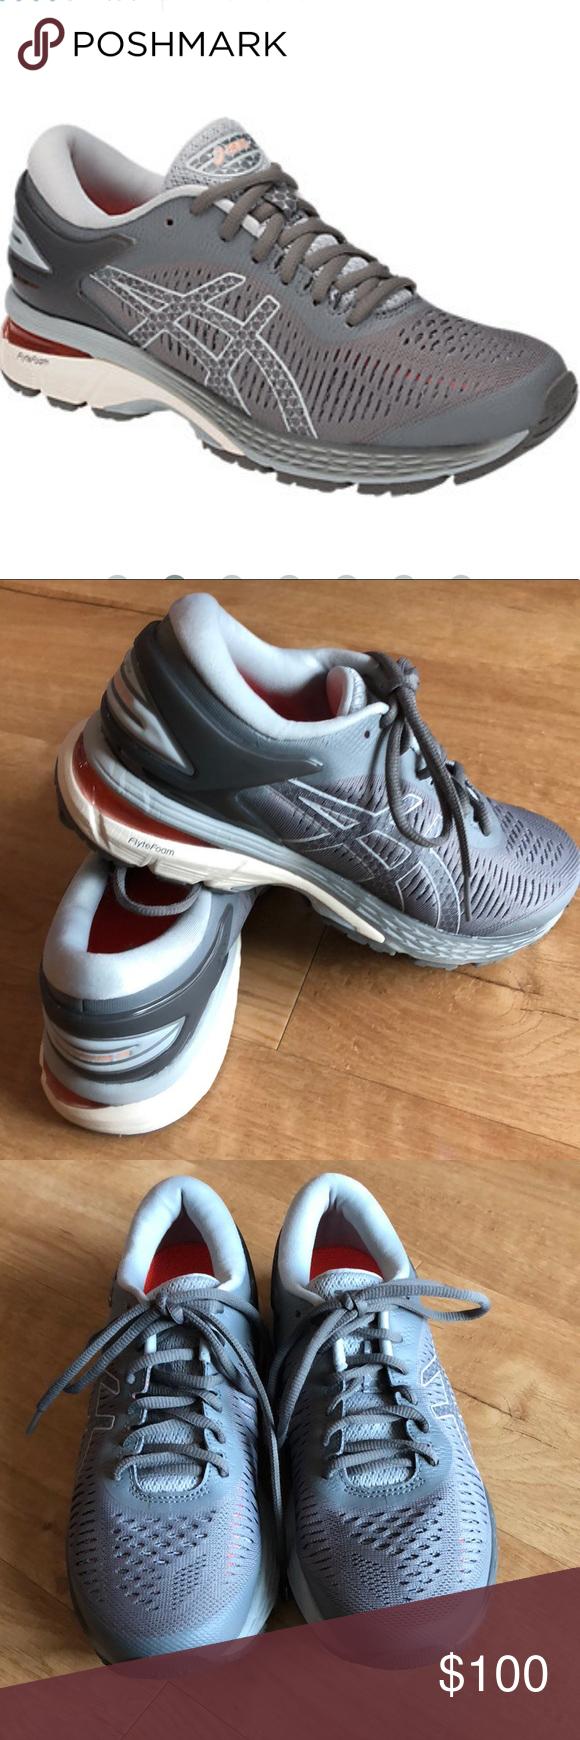 Asics Gel Kayano 25 Women S Running Shoe Euc Shoes Running Shoes Womens Running Shoes